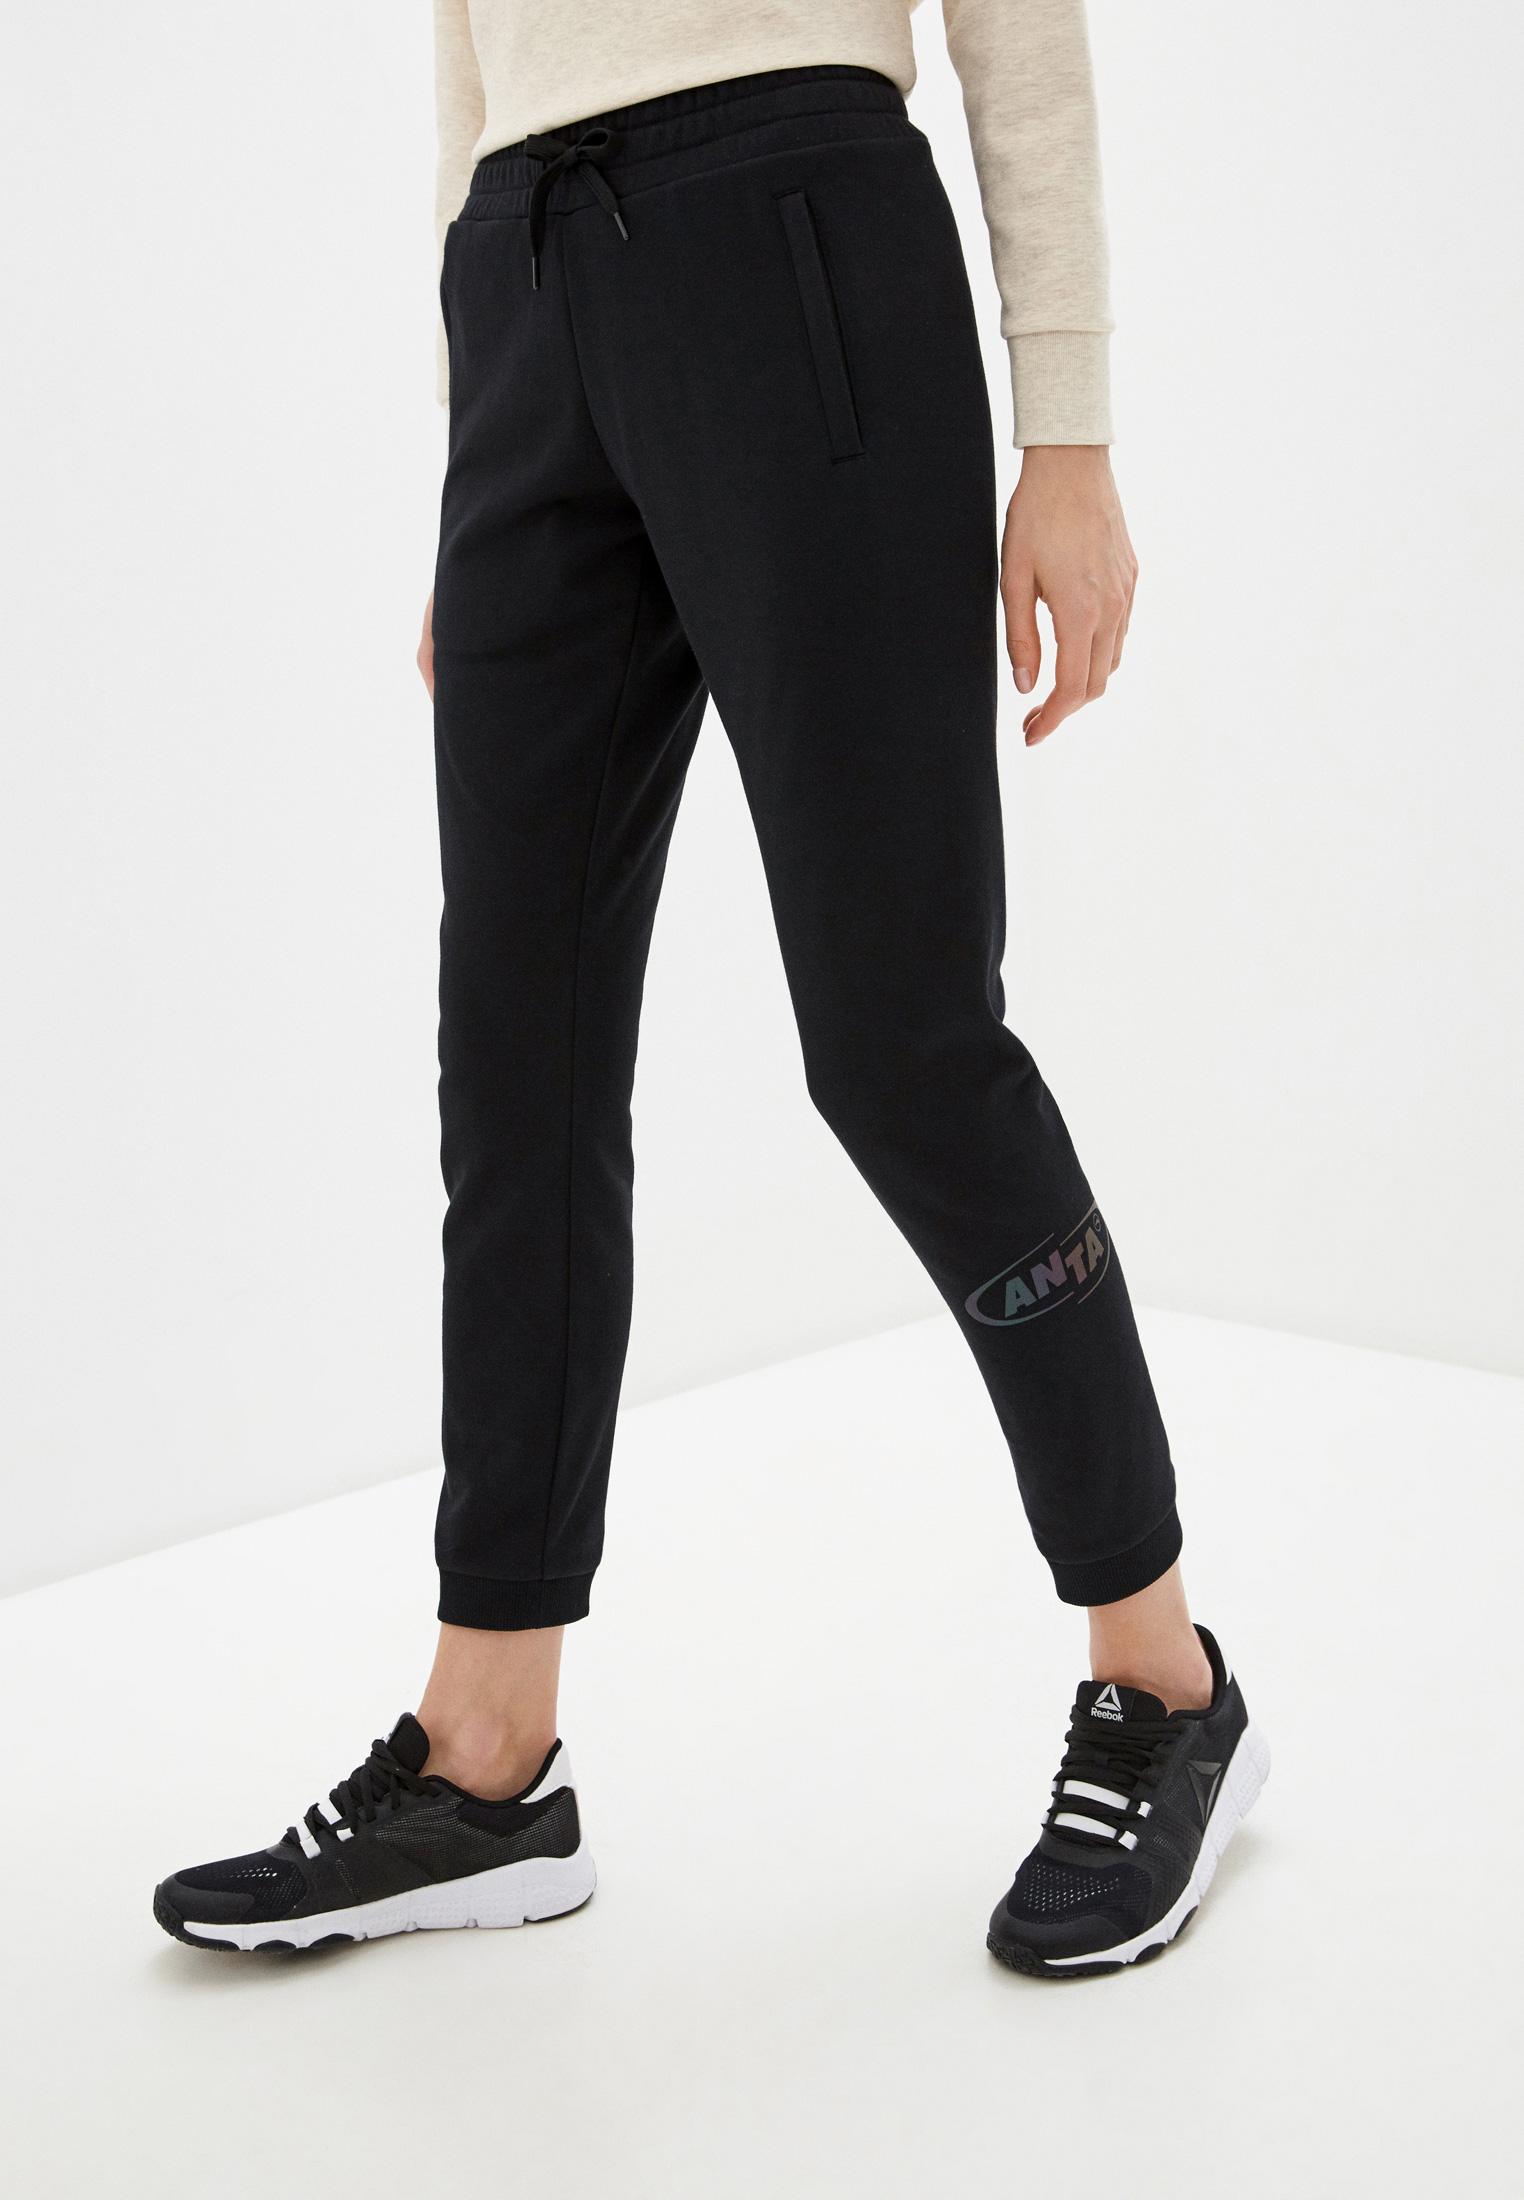 Женские брюки Anta (Анта) 862018363-1